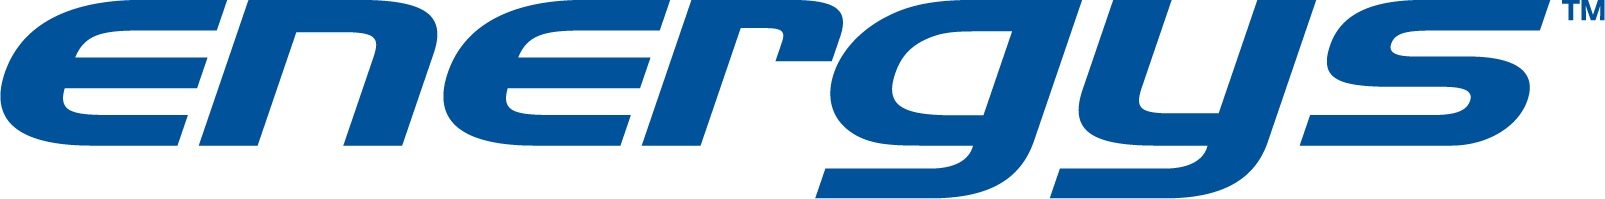 Energys Logo 2018.png